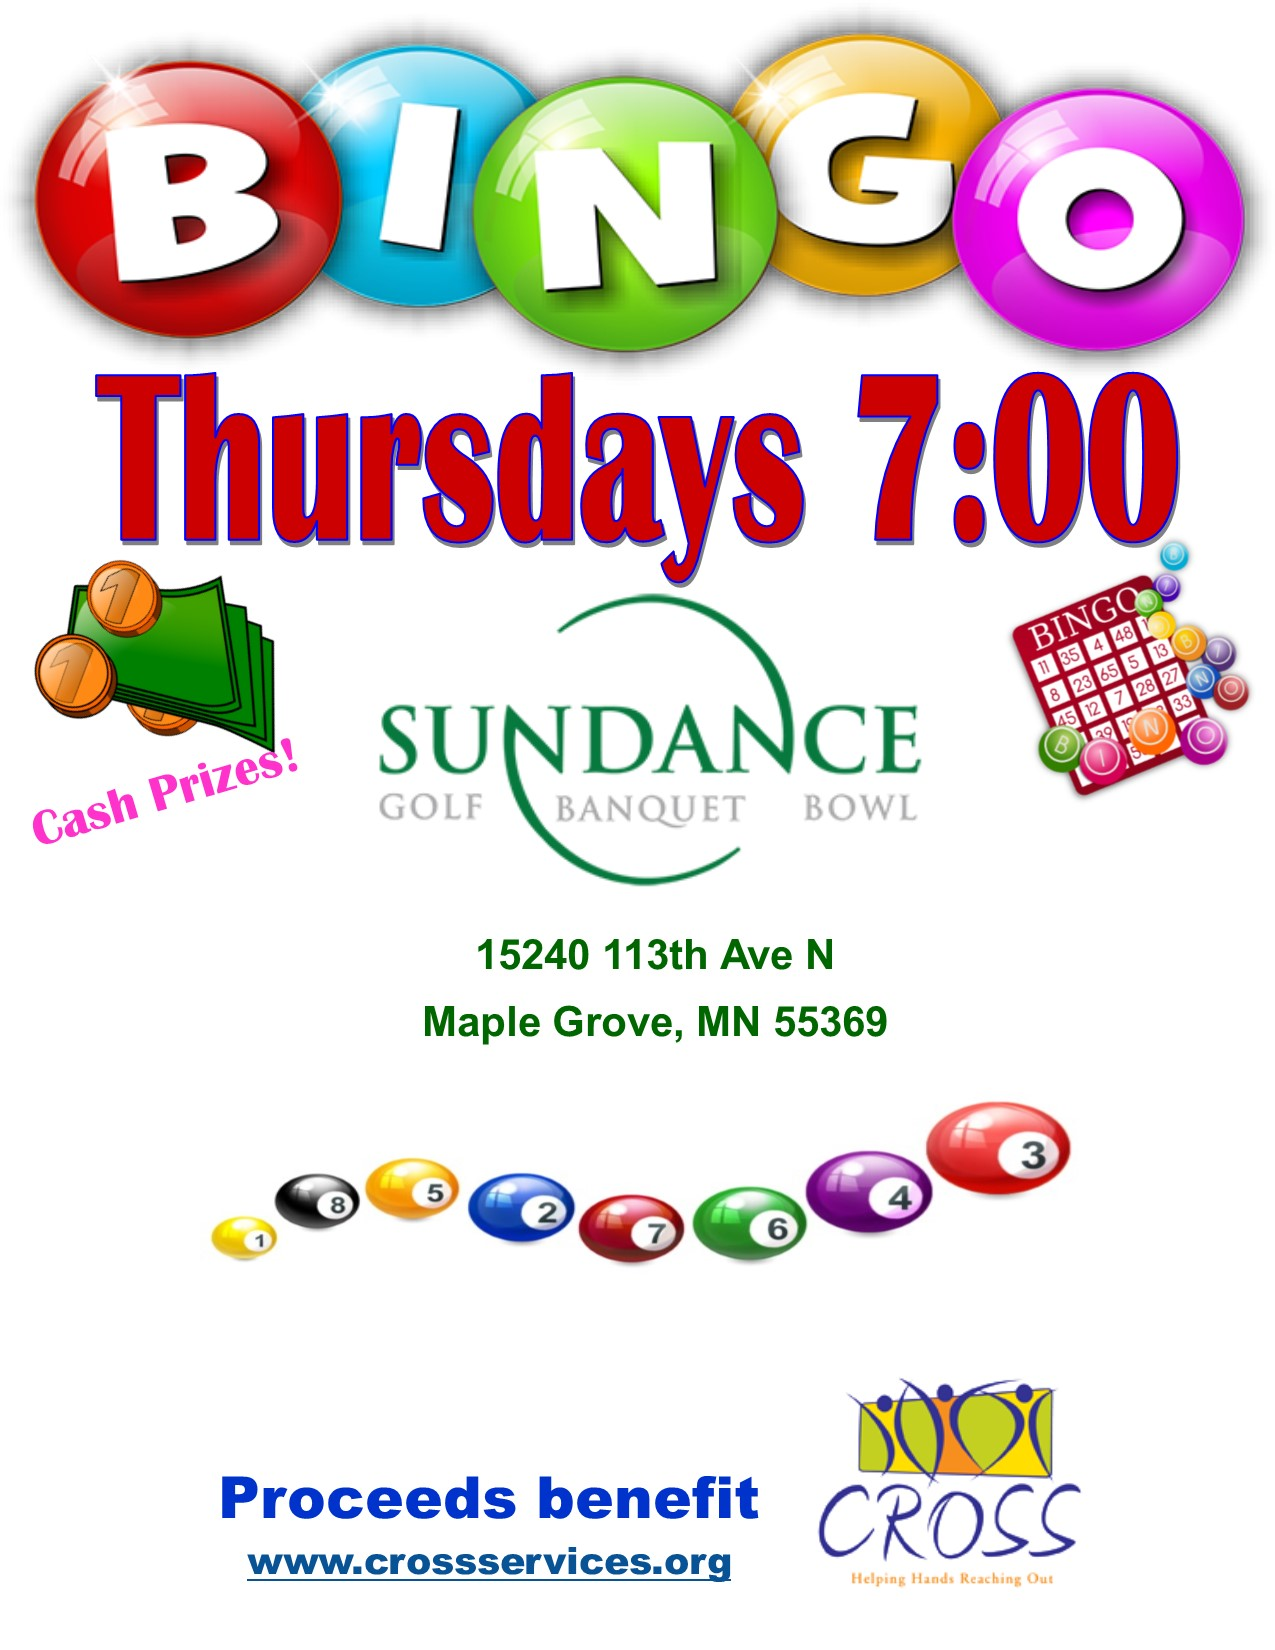 Bingo - Starting November 30, 2017